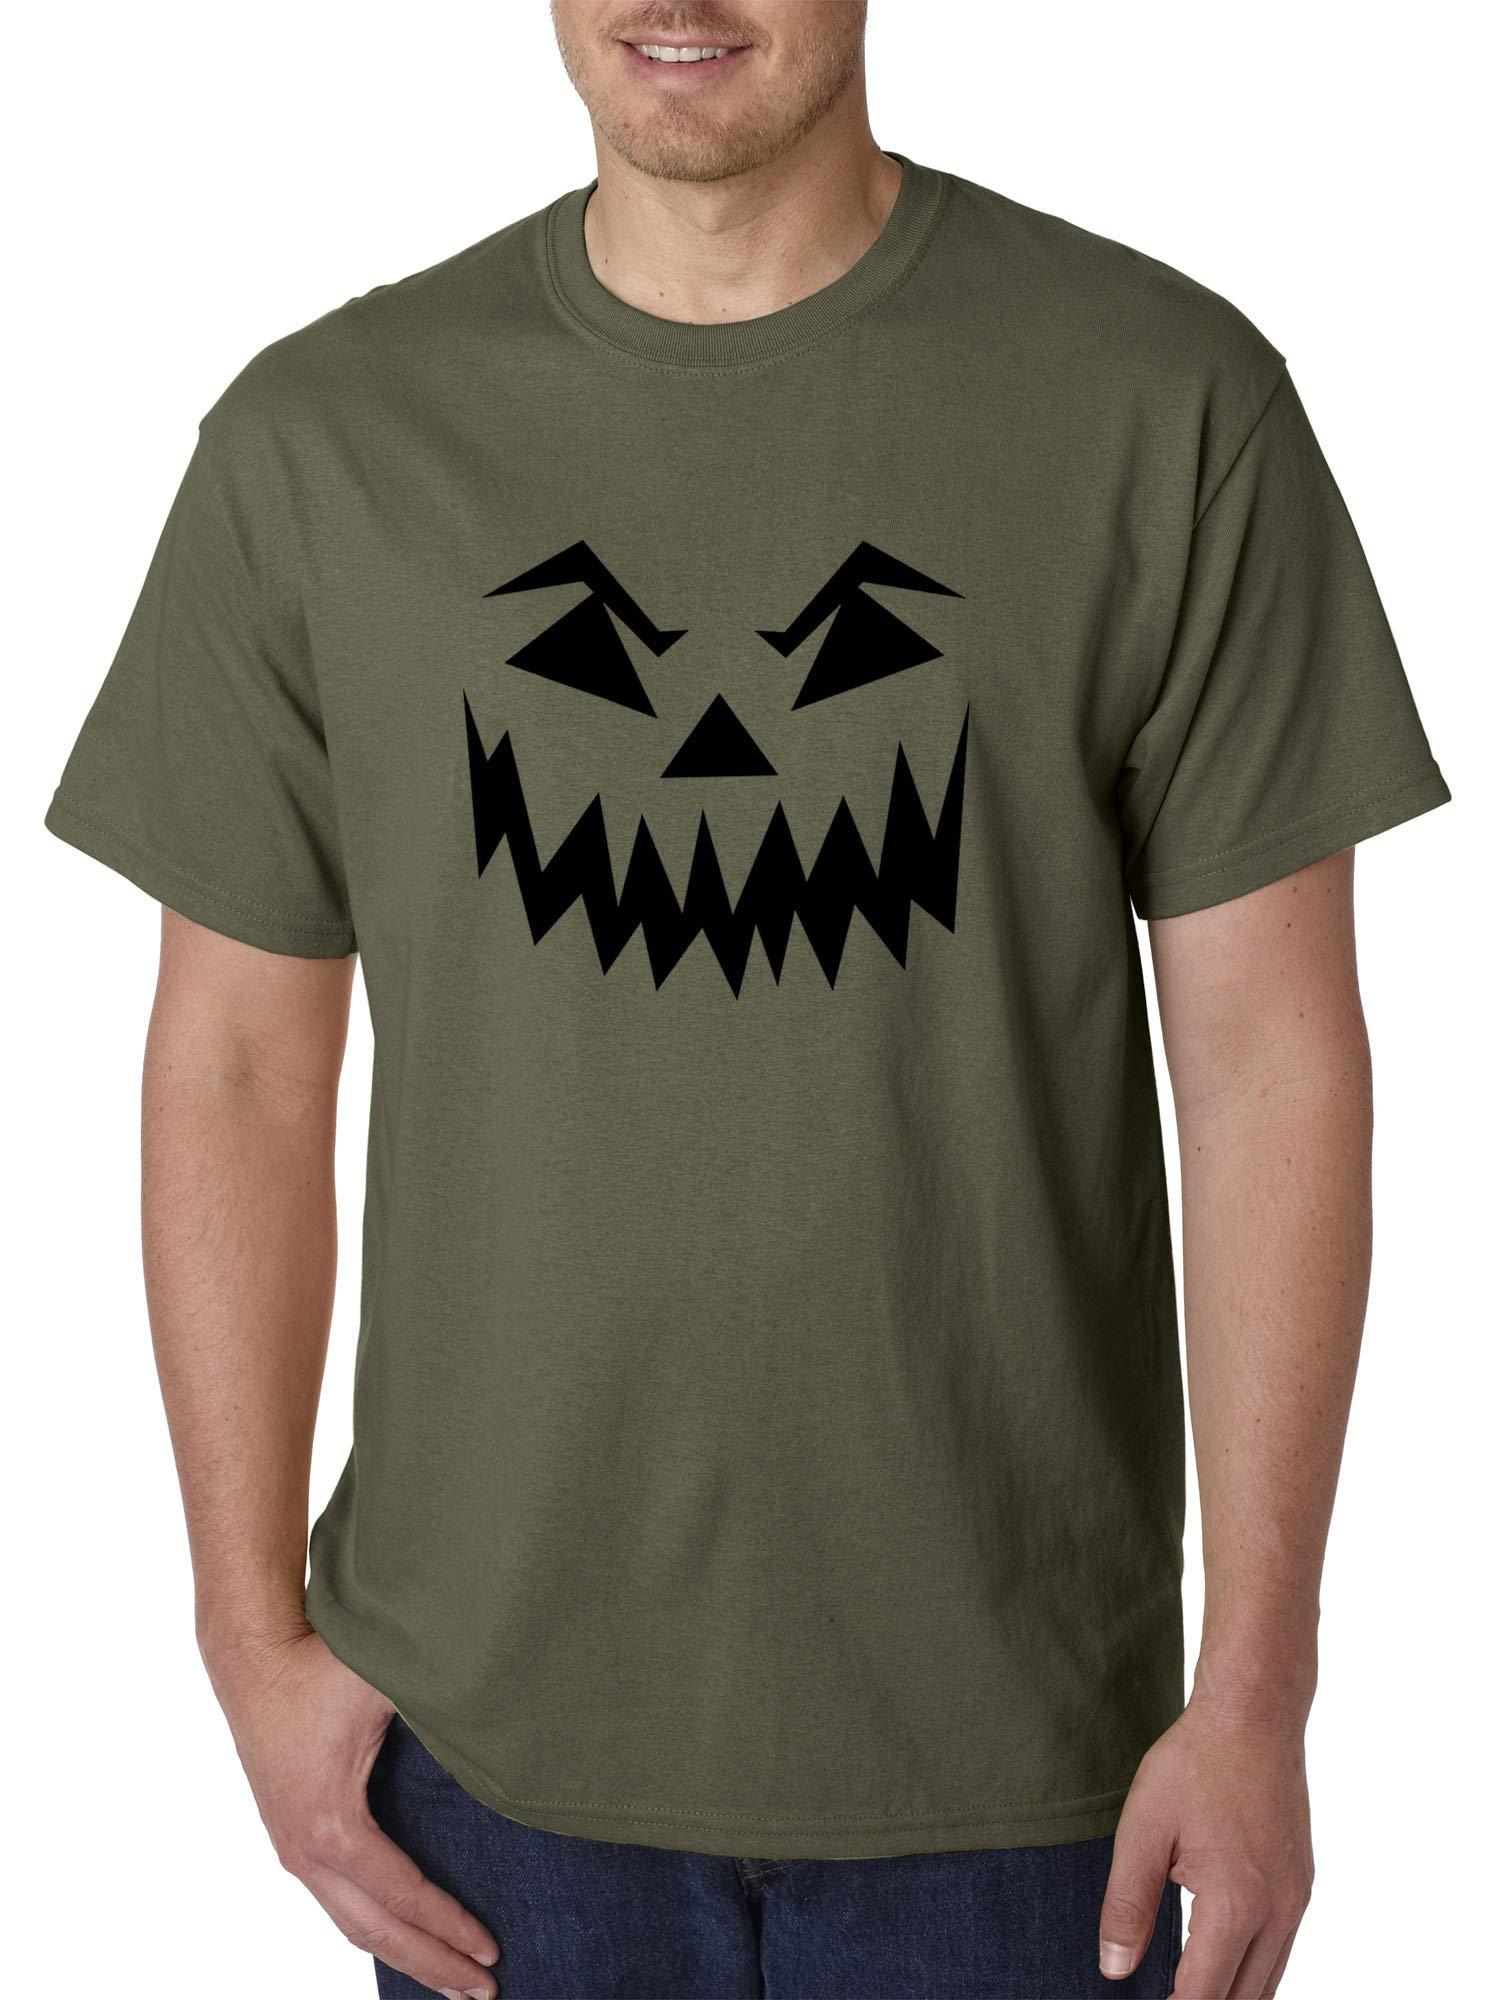 972 Unisex Scary Halloween Pumpkin Face Jack O Lantern Shirts